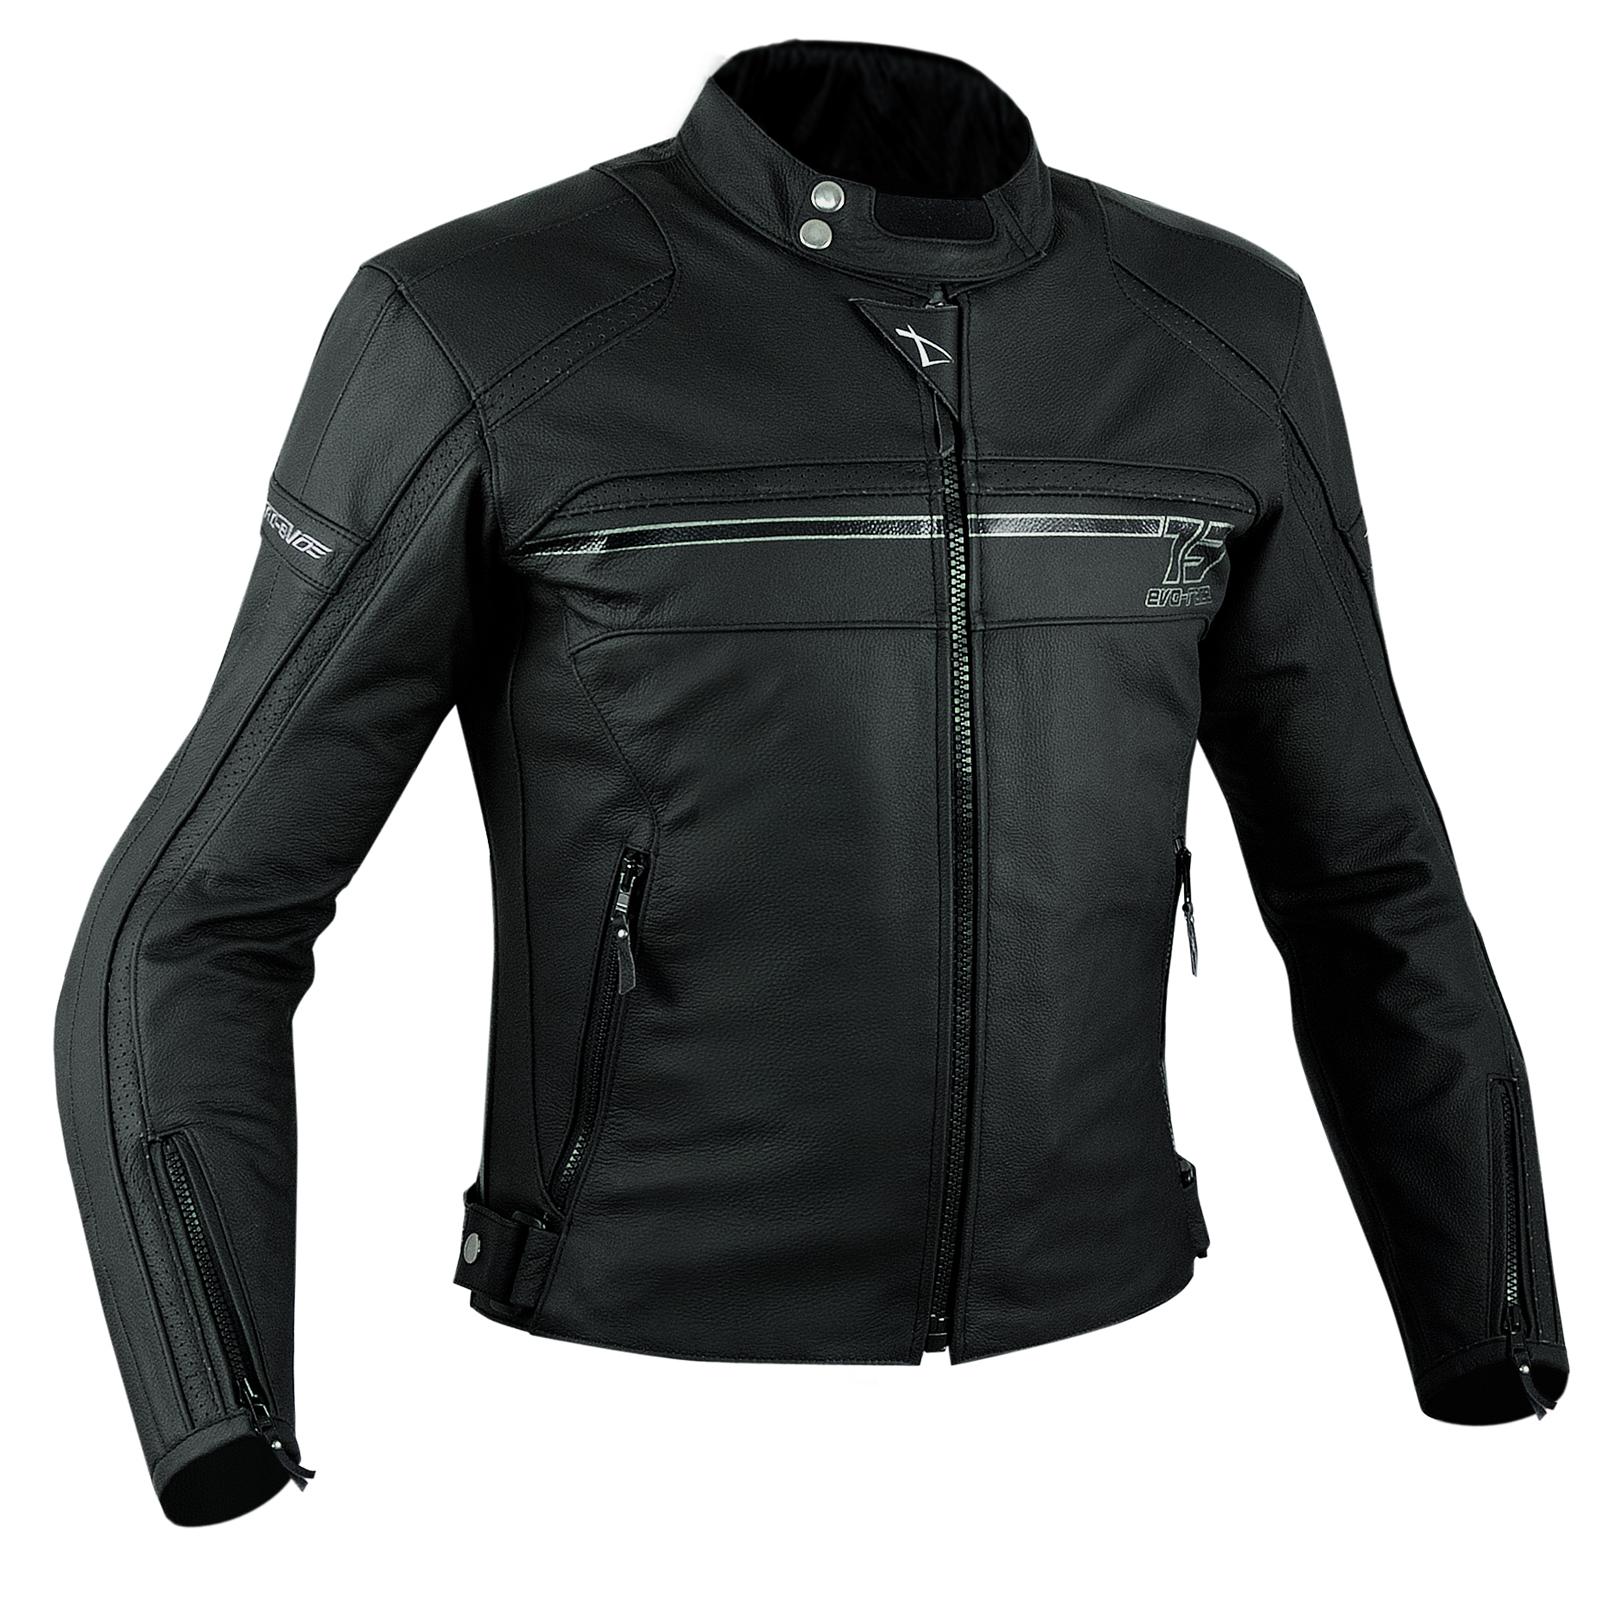 Sport-Giacca-Pelle-Moto-Naked-Custom-Protezioni-Omologate-CE-Rinforzo-Schiena